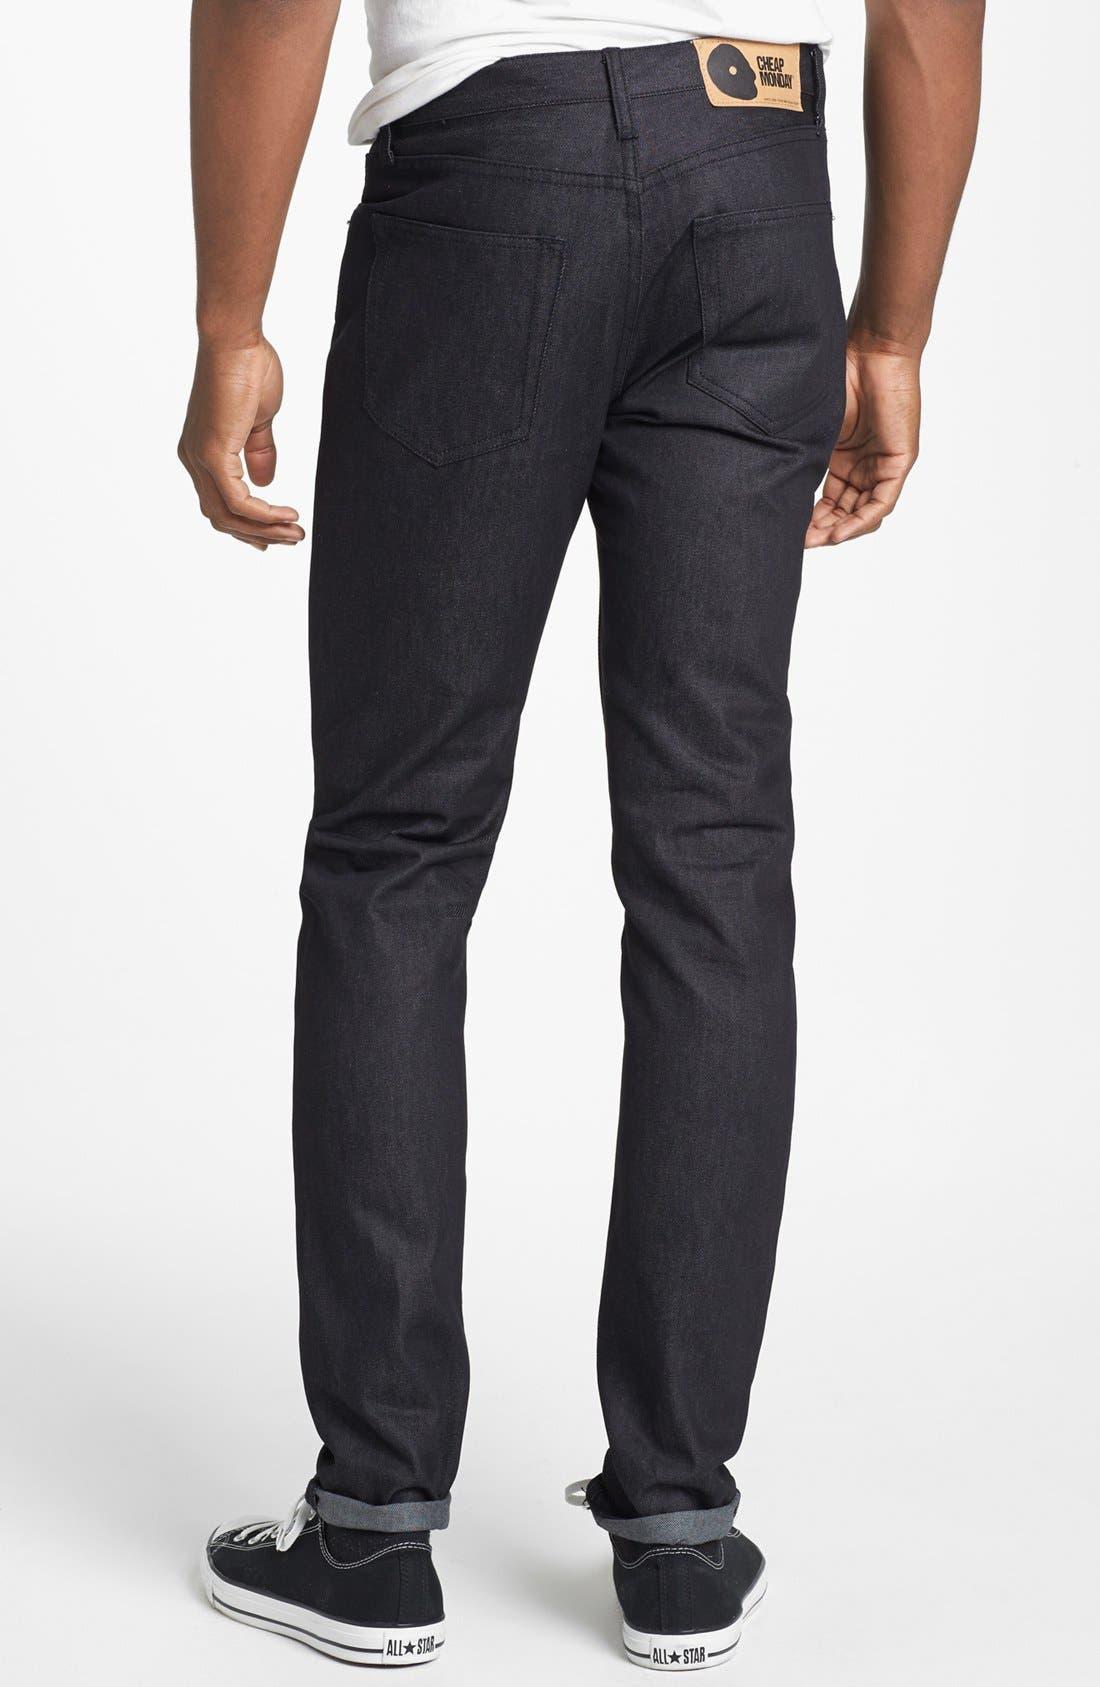 Alternate Image 1 Selected - Cheap Monday 'Four' Slim Straight Leg Jeans (Dry Black)